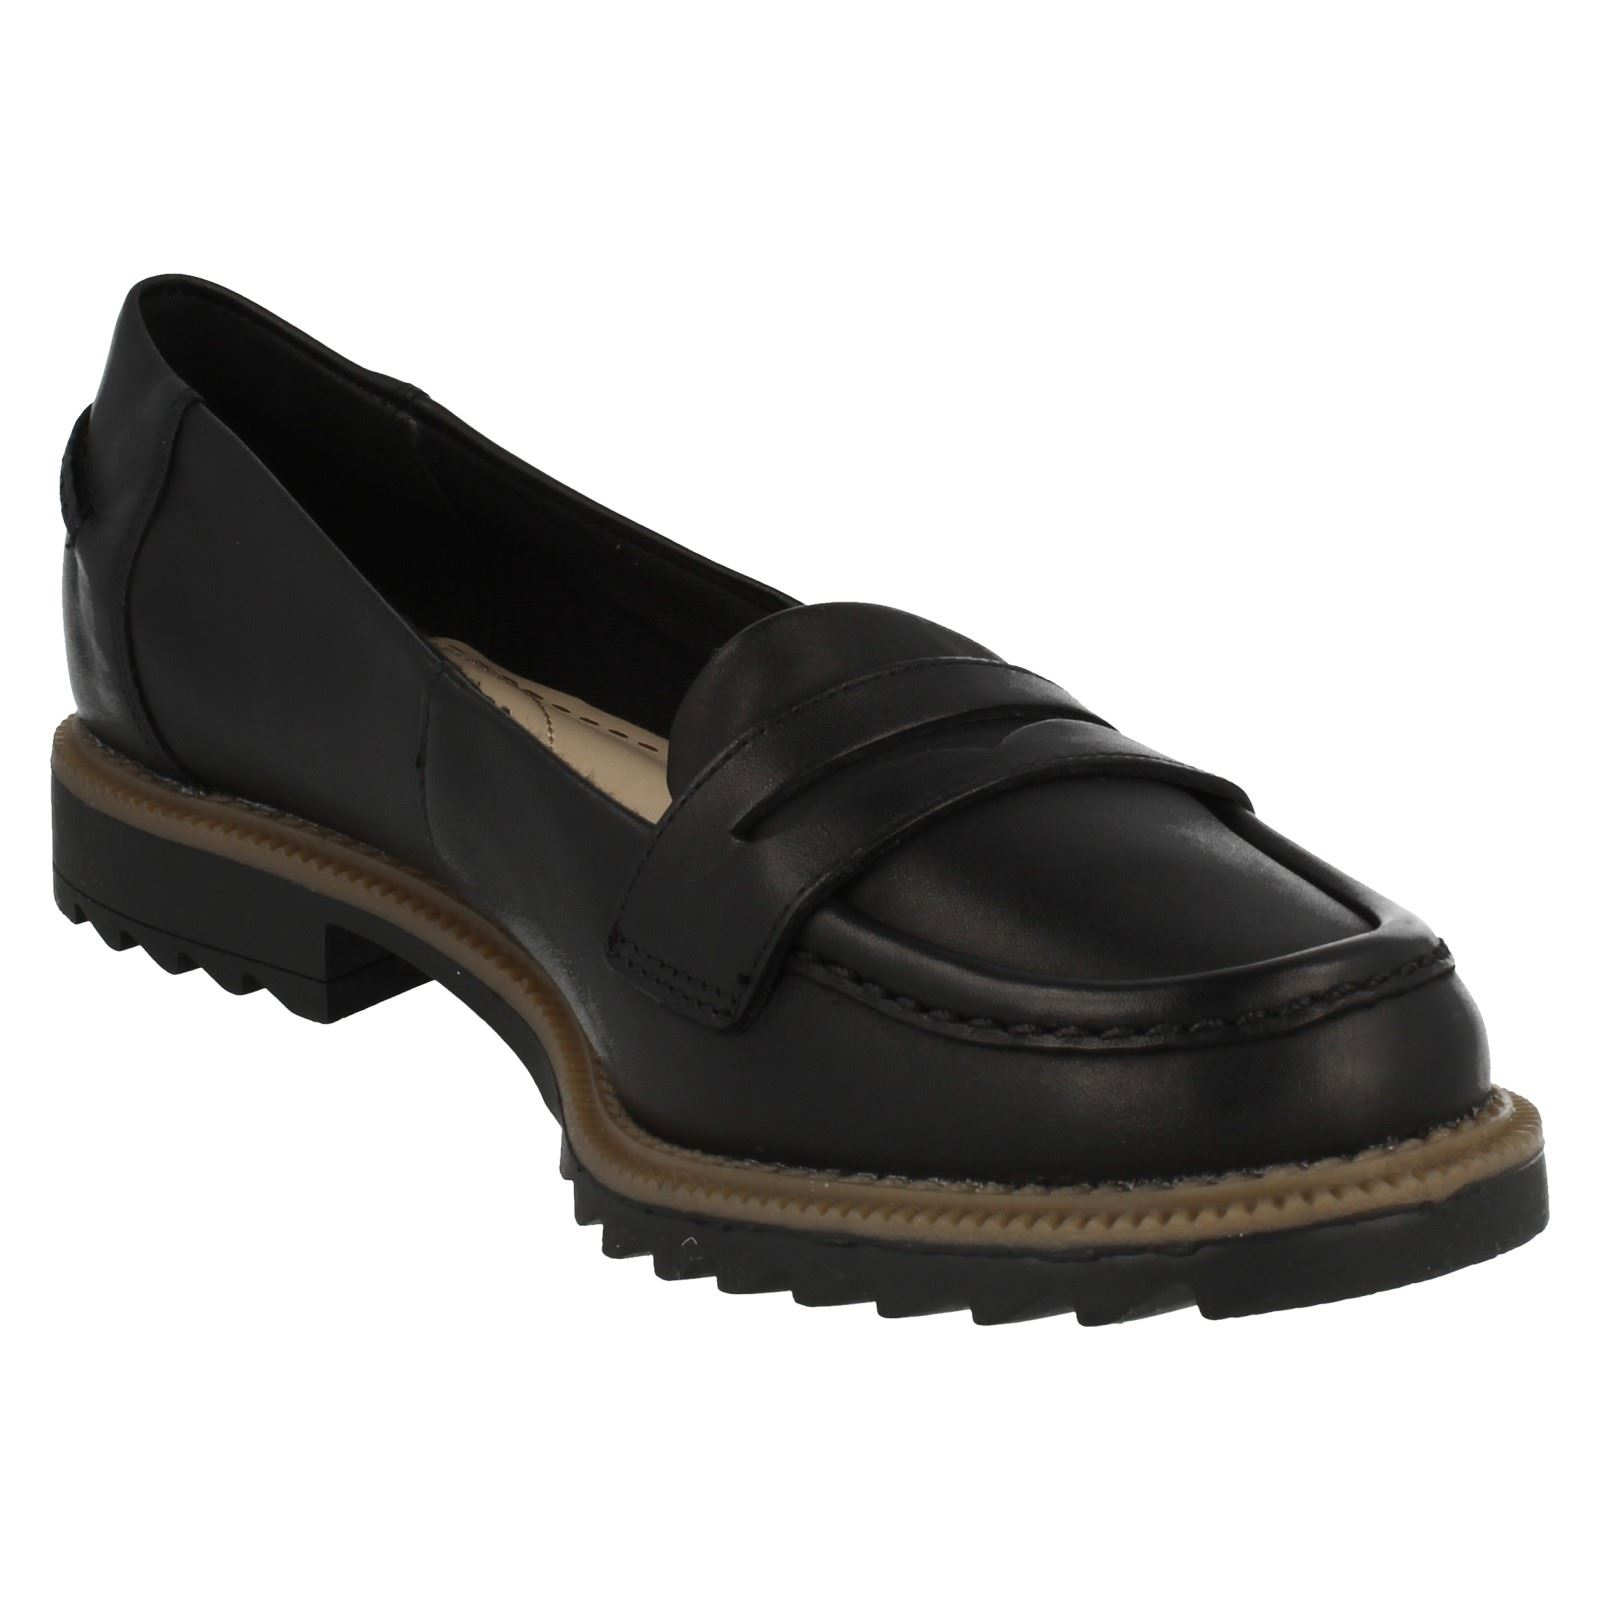 Damen Clarks Smart Slipper Milly